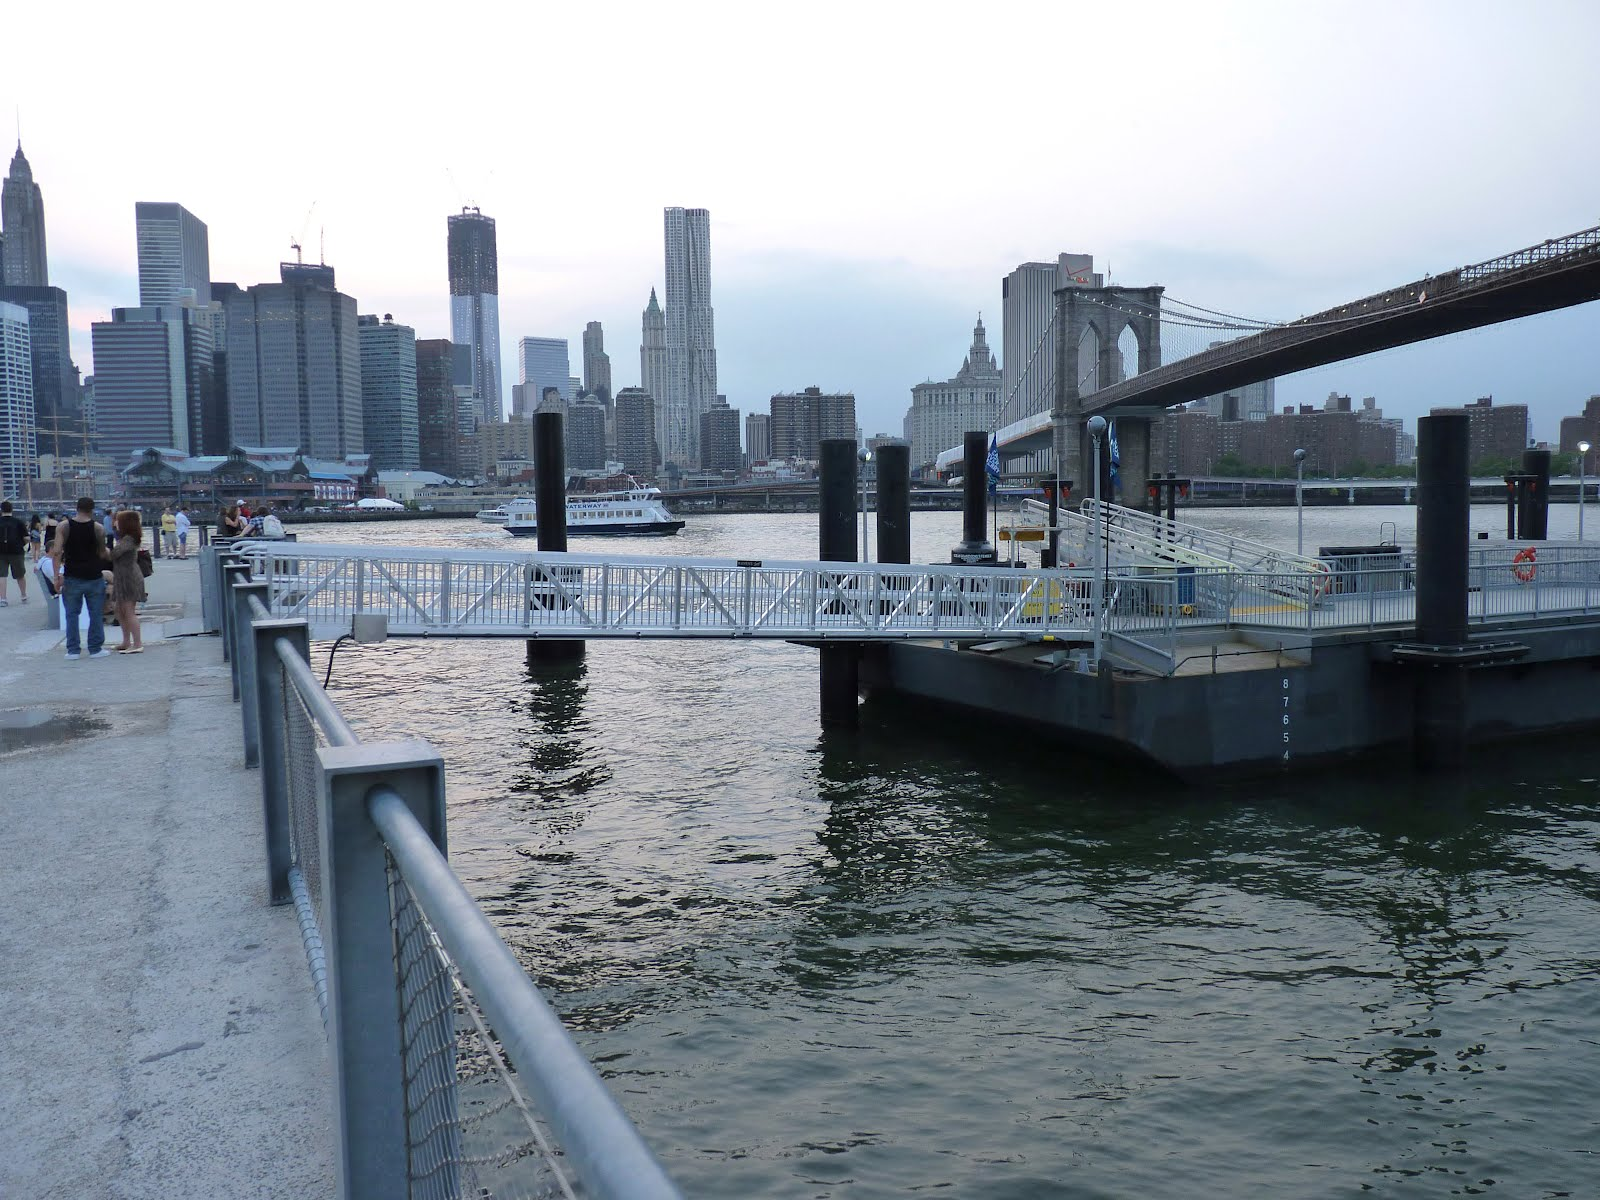 mcbrooklyn: New Pier 1 Dock, Bigger Ferries at Brooklyn